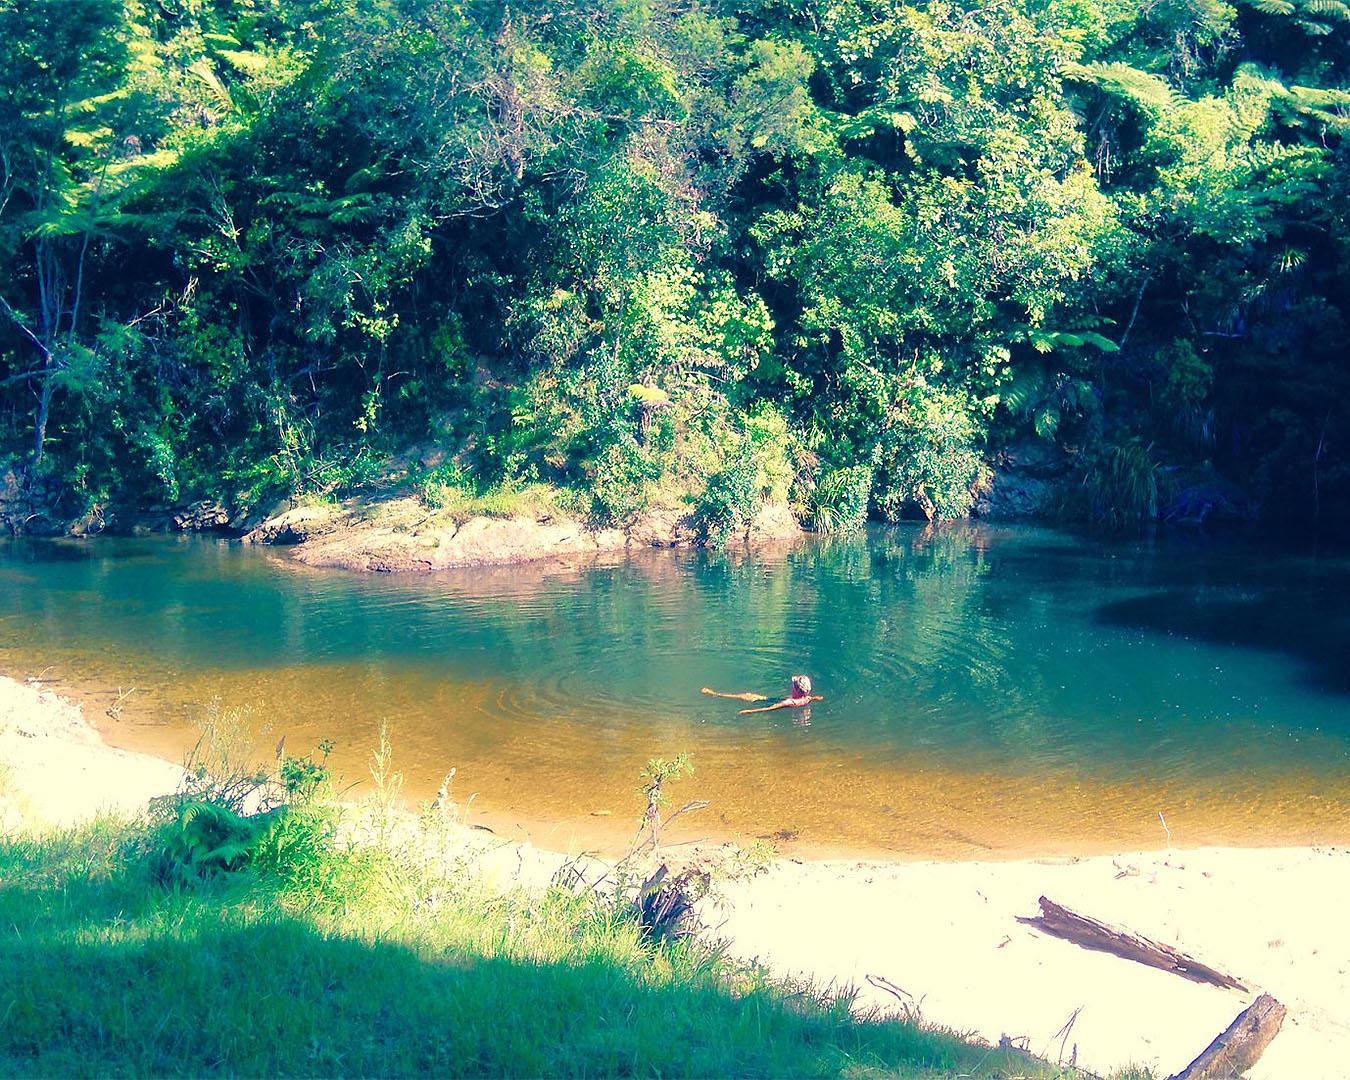 Someone swims at the swimming hole at Coro Camping Whitianga